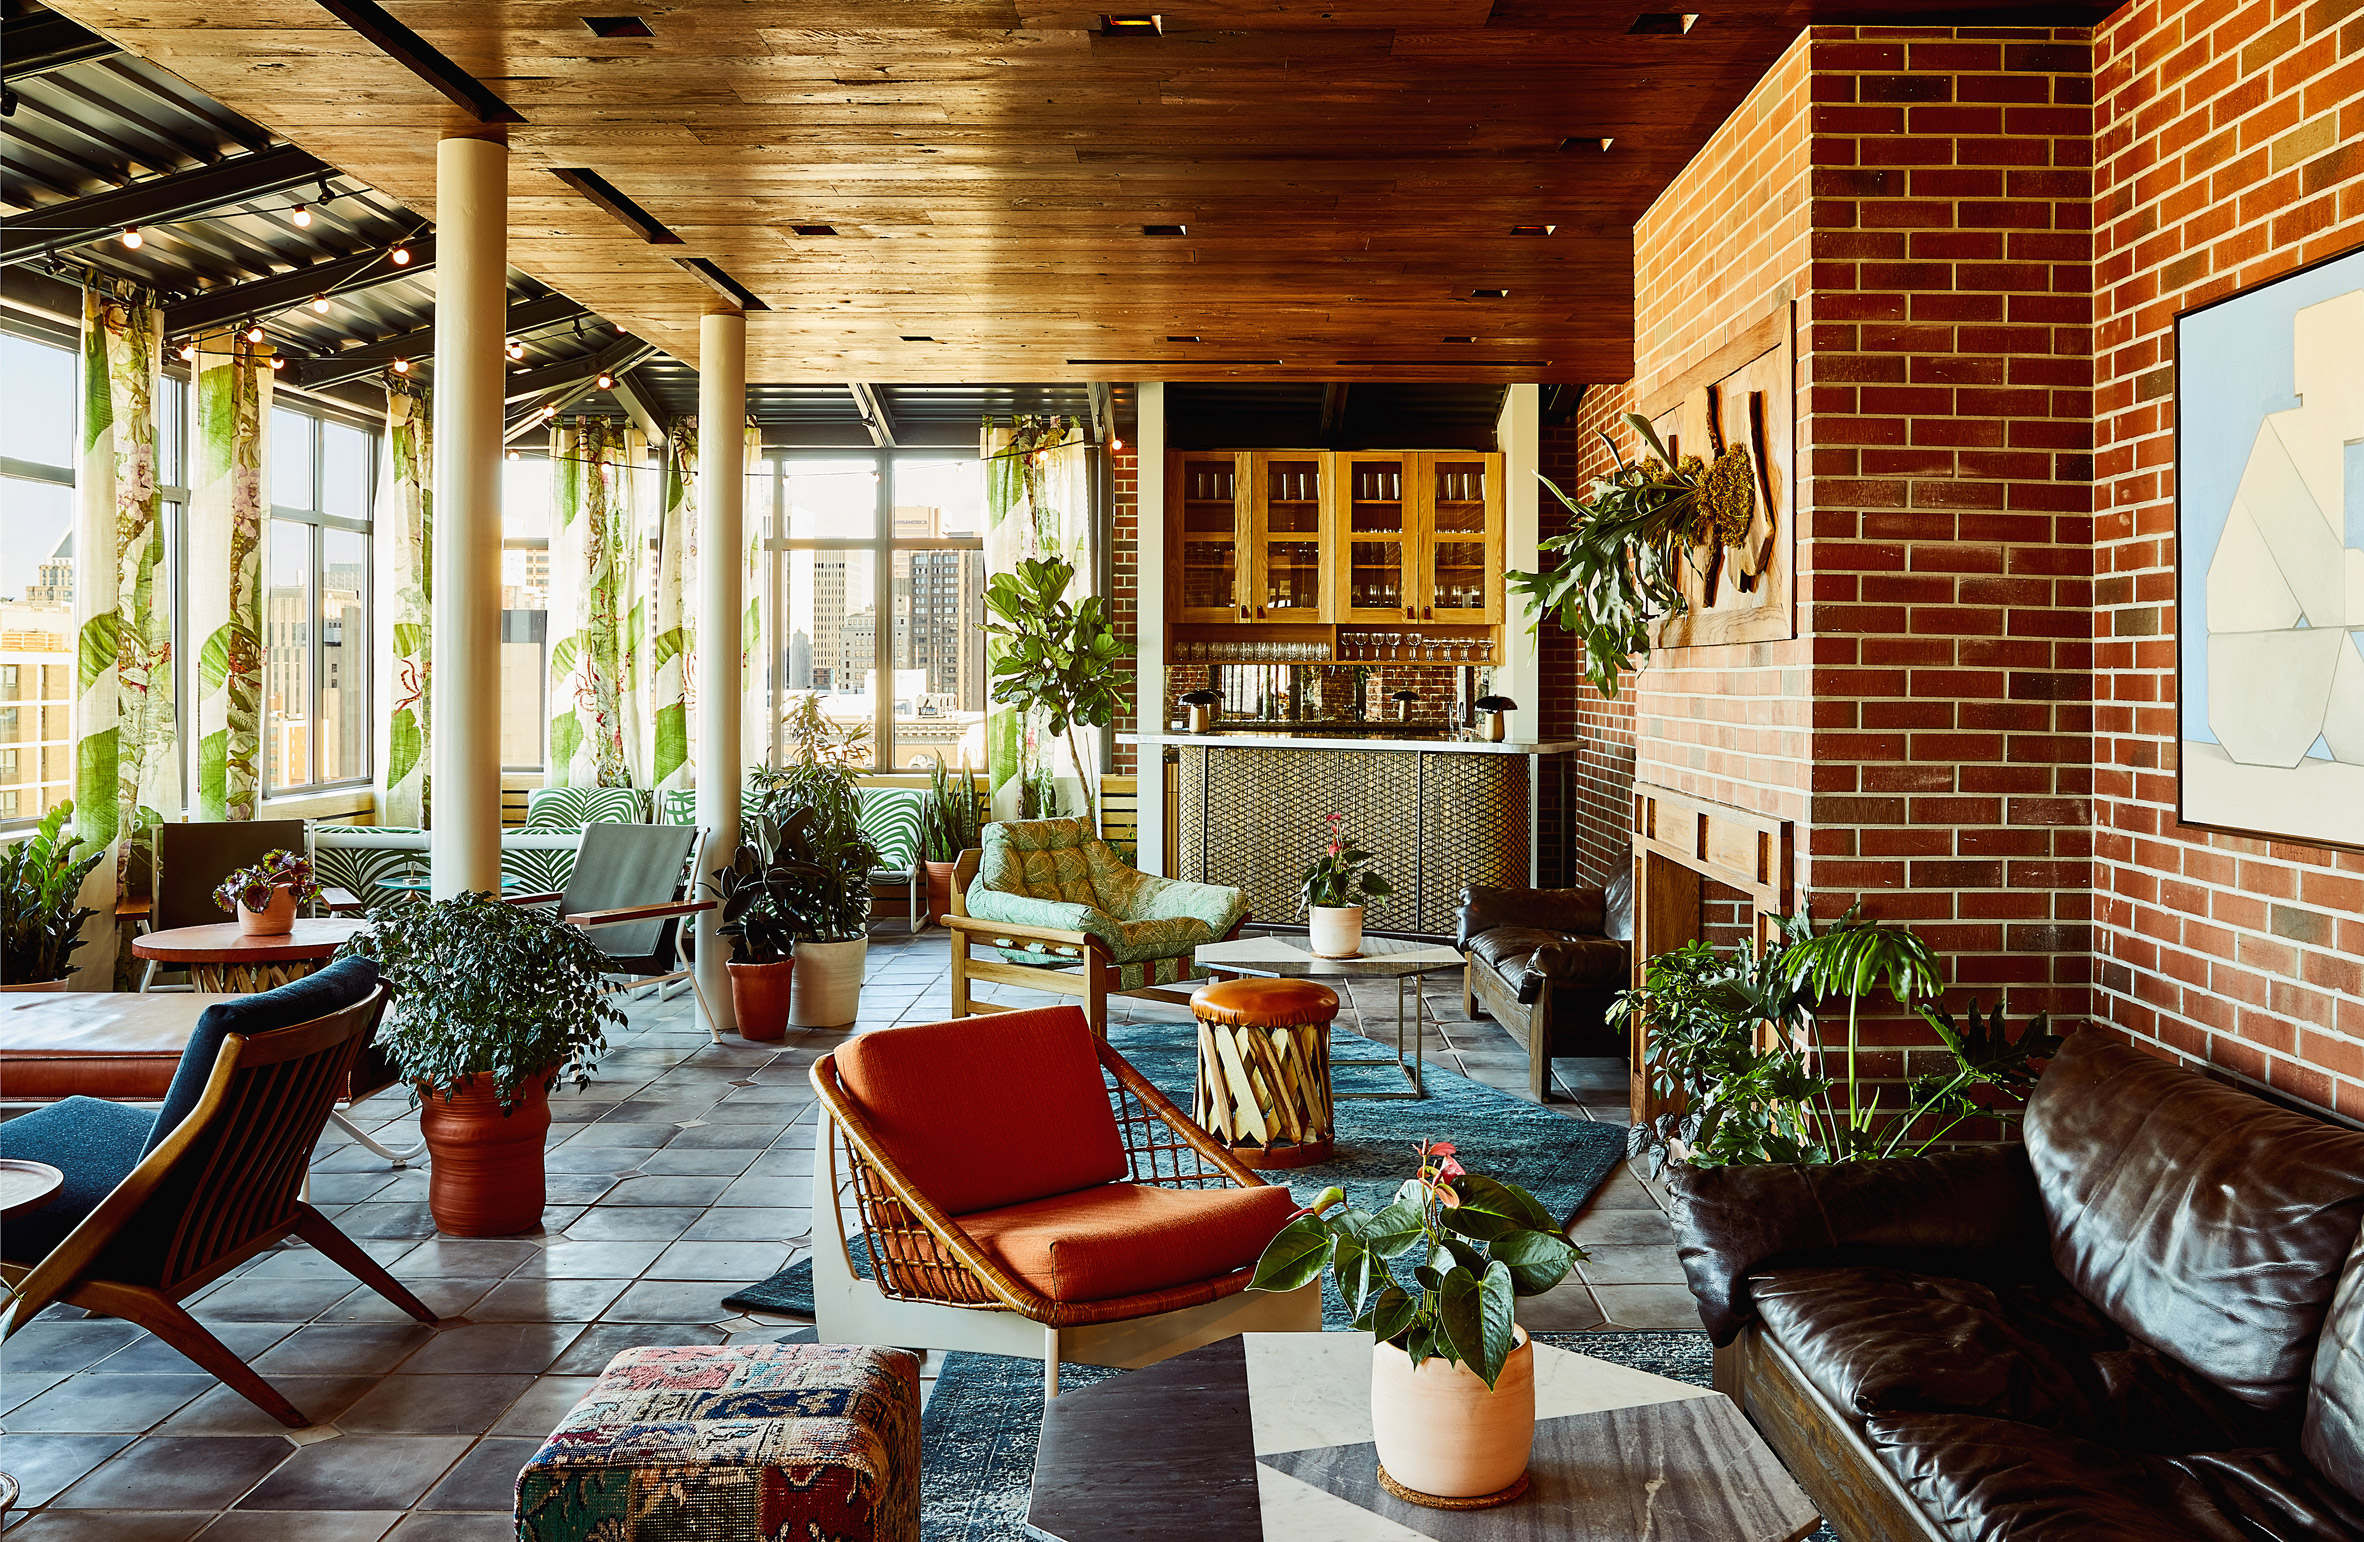 Revival hotel by SL Design